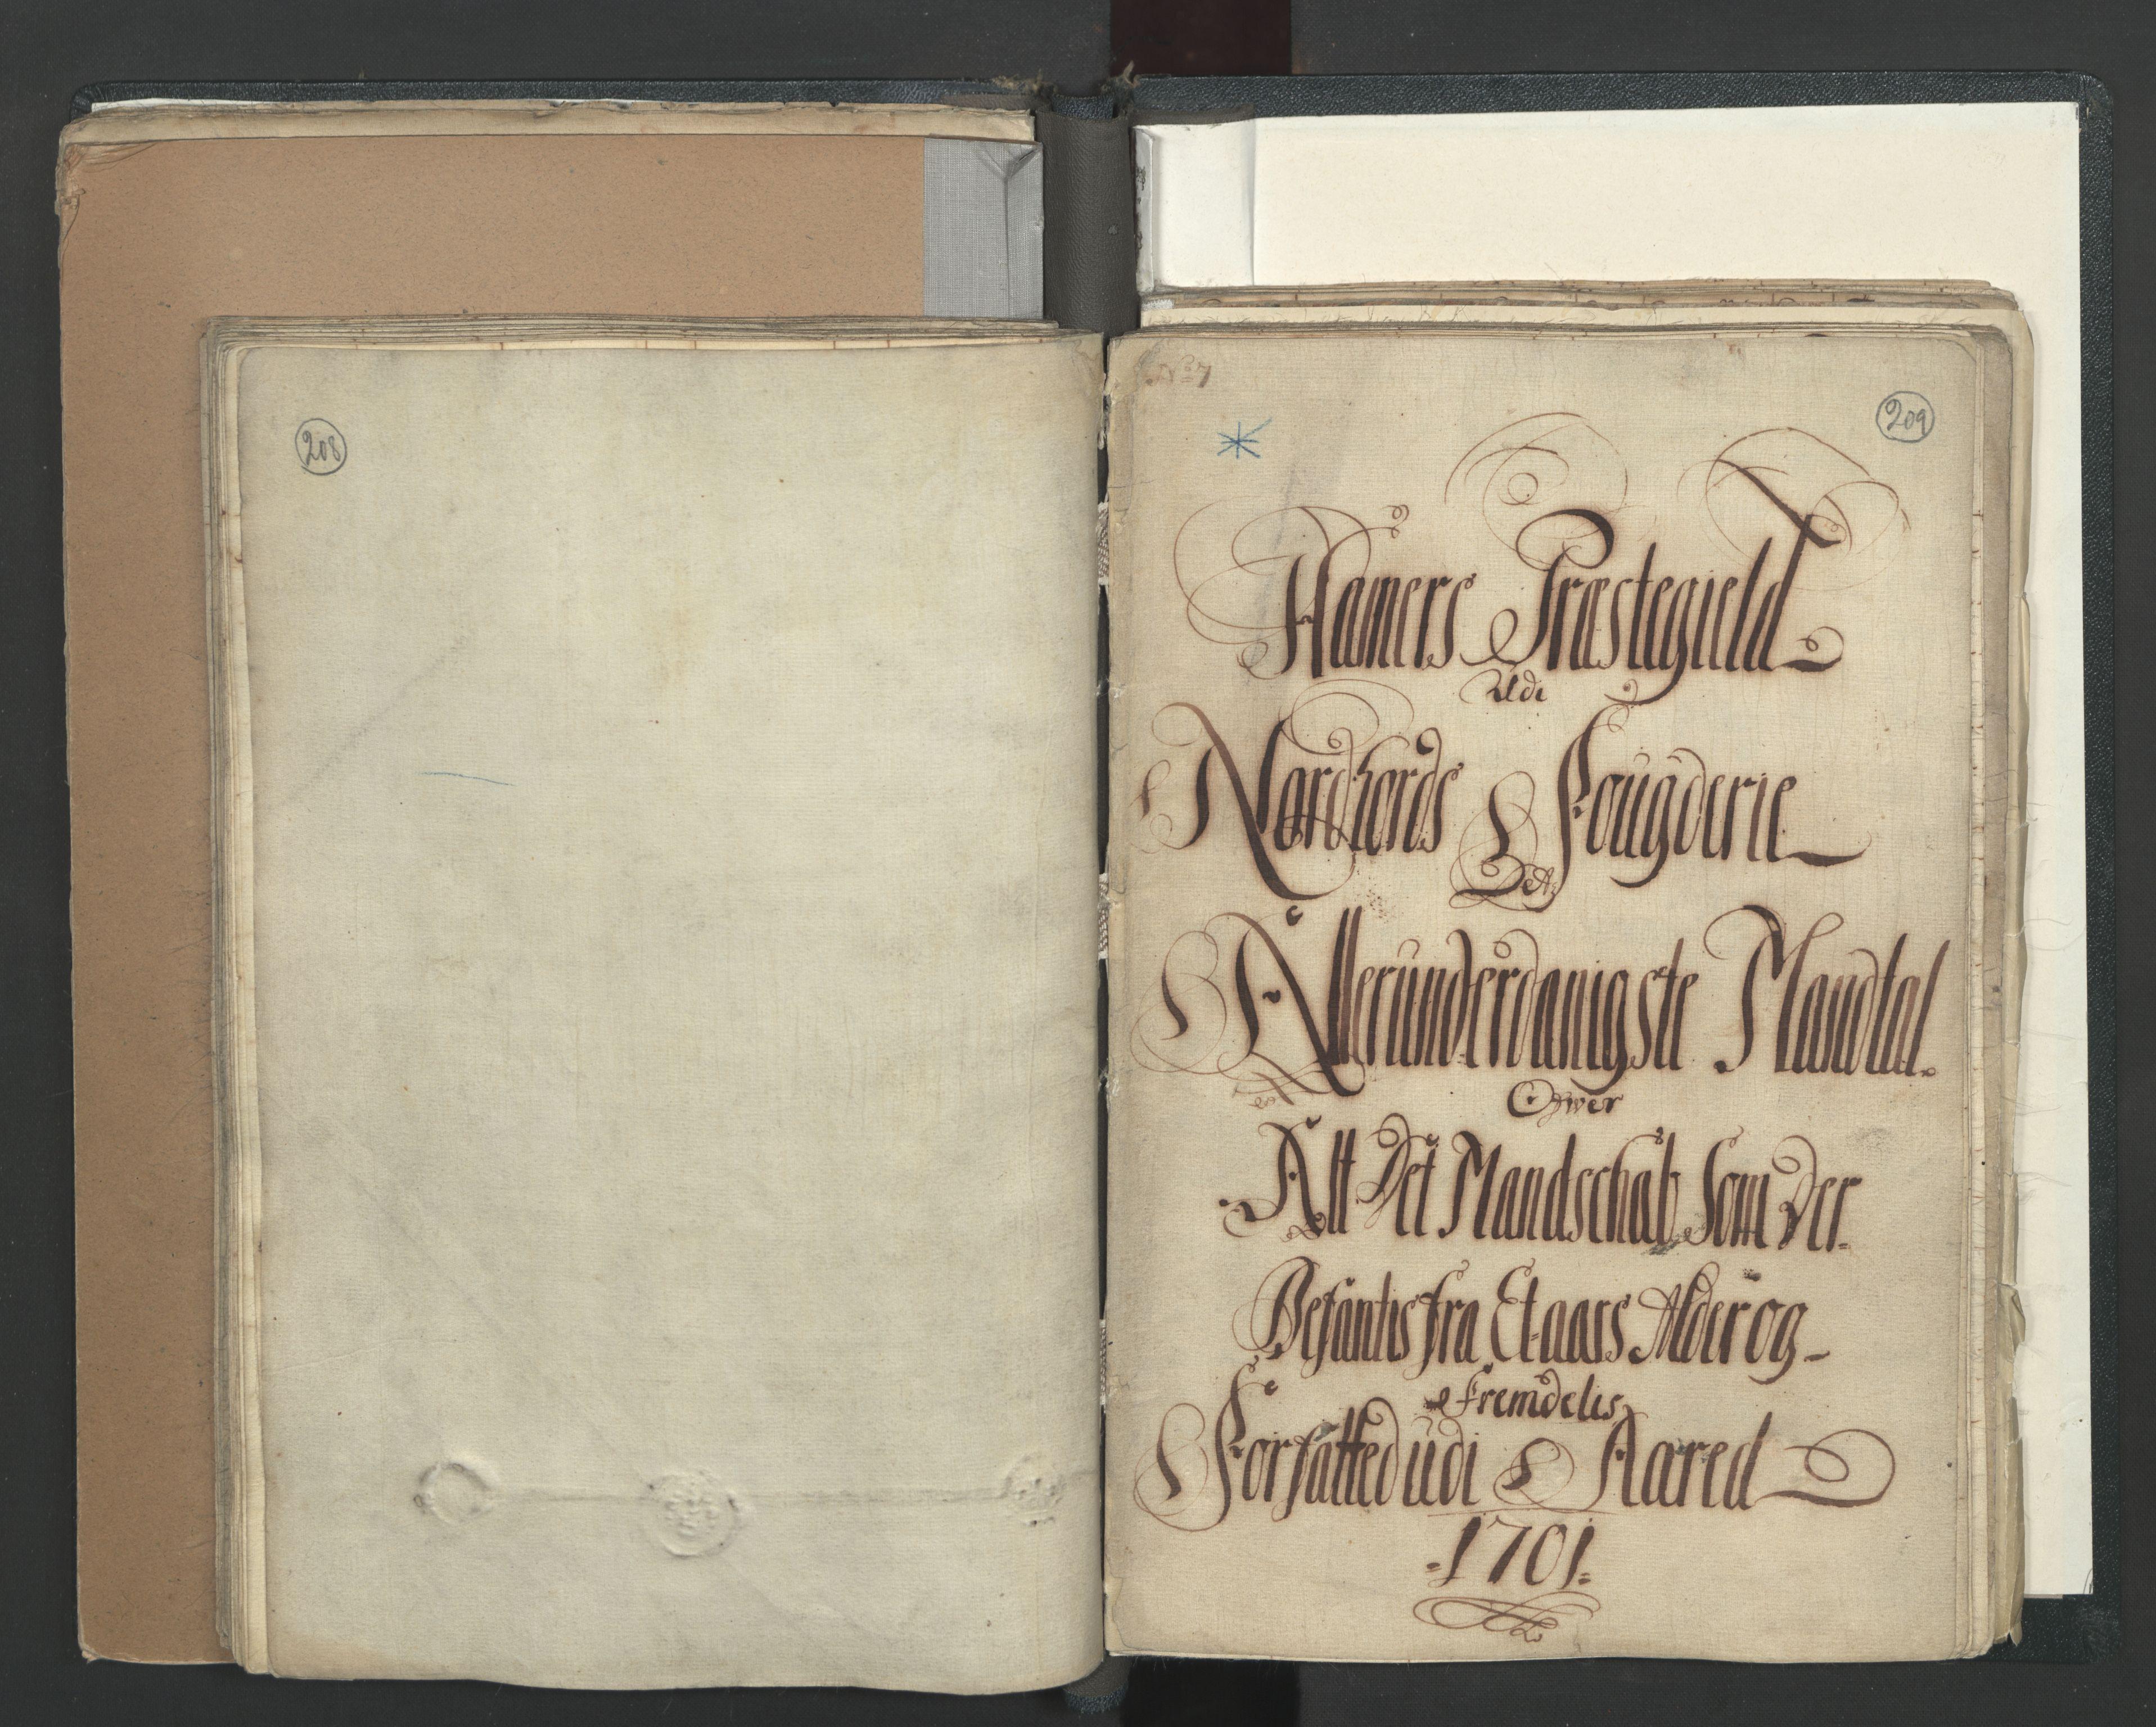 RA, Manntallet 1701, nr. 7: Nordhordland og Voss fogderi, 1701, s. 208-209